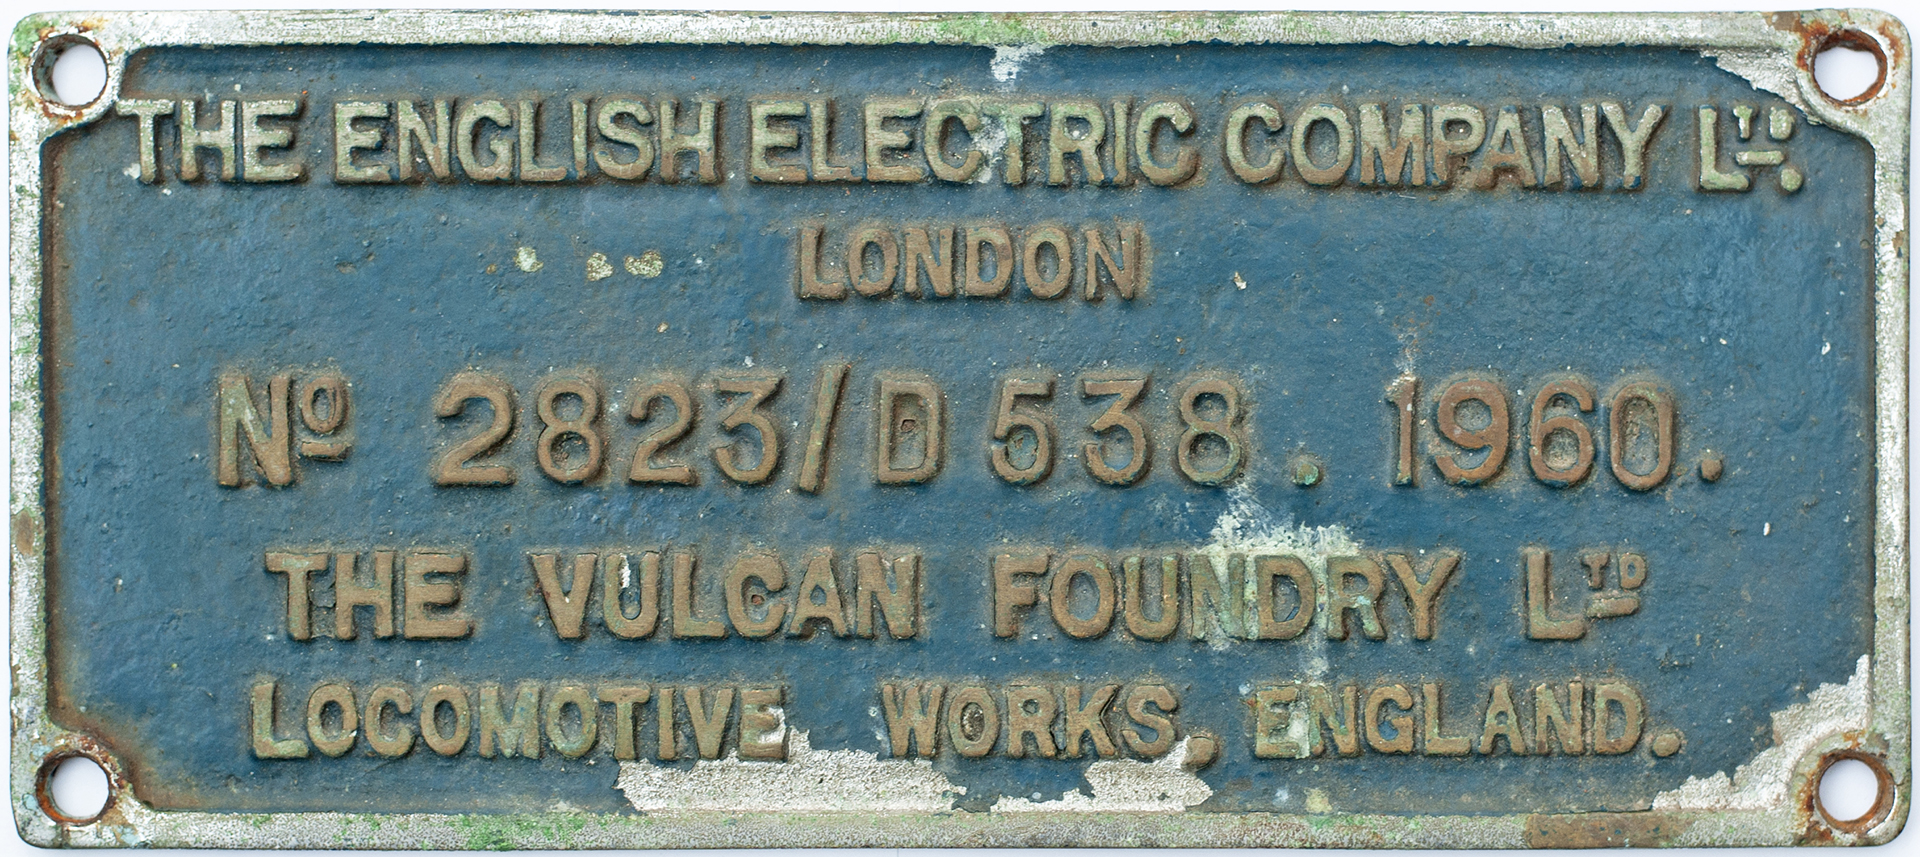 Worksplate THE ENGLISH ELECTRIC COMPANY LTD LONDON